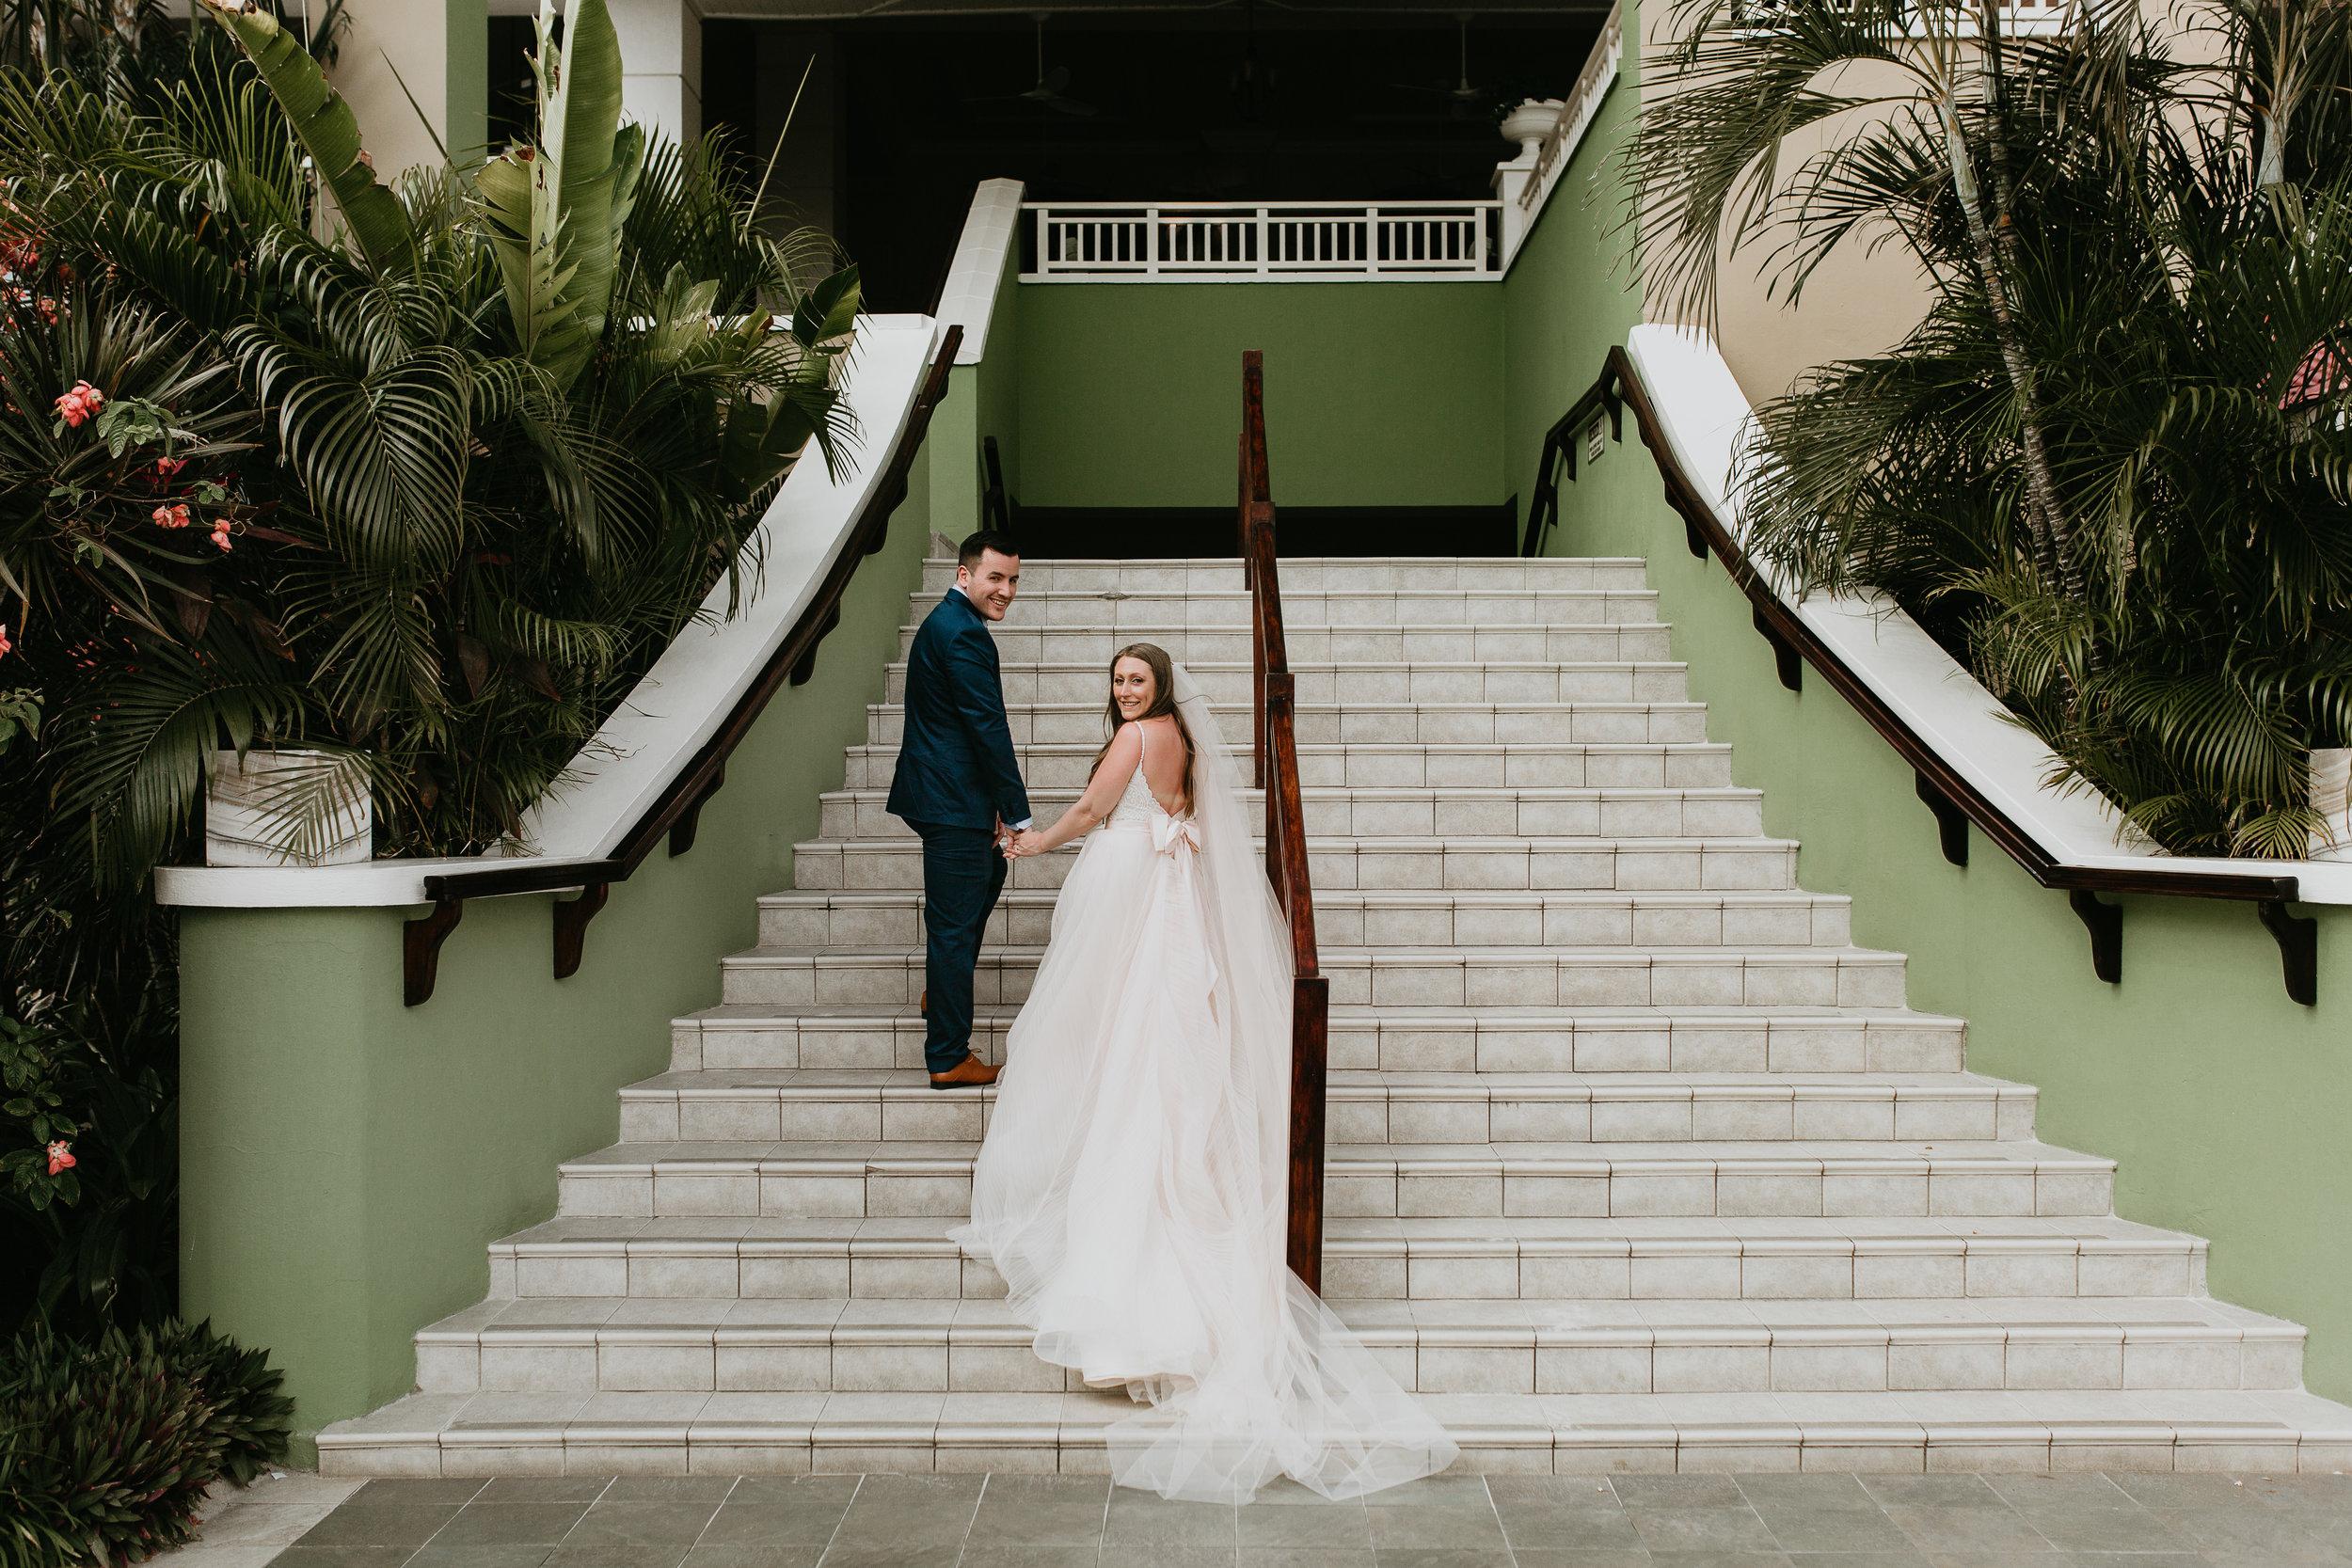 nicole-daacke-photography-destination-wedding-in-st-lucia-sandals-la-toc-intimate-island-wedding-carribean-elopement-photographer-chill-island-wedding-45.jpg